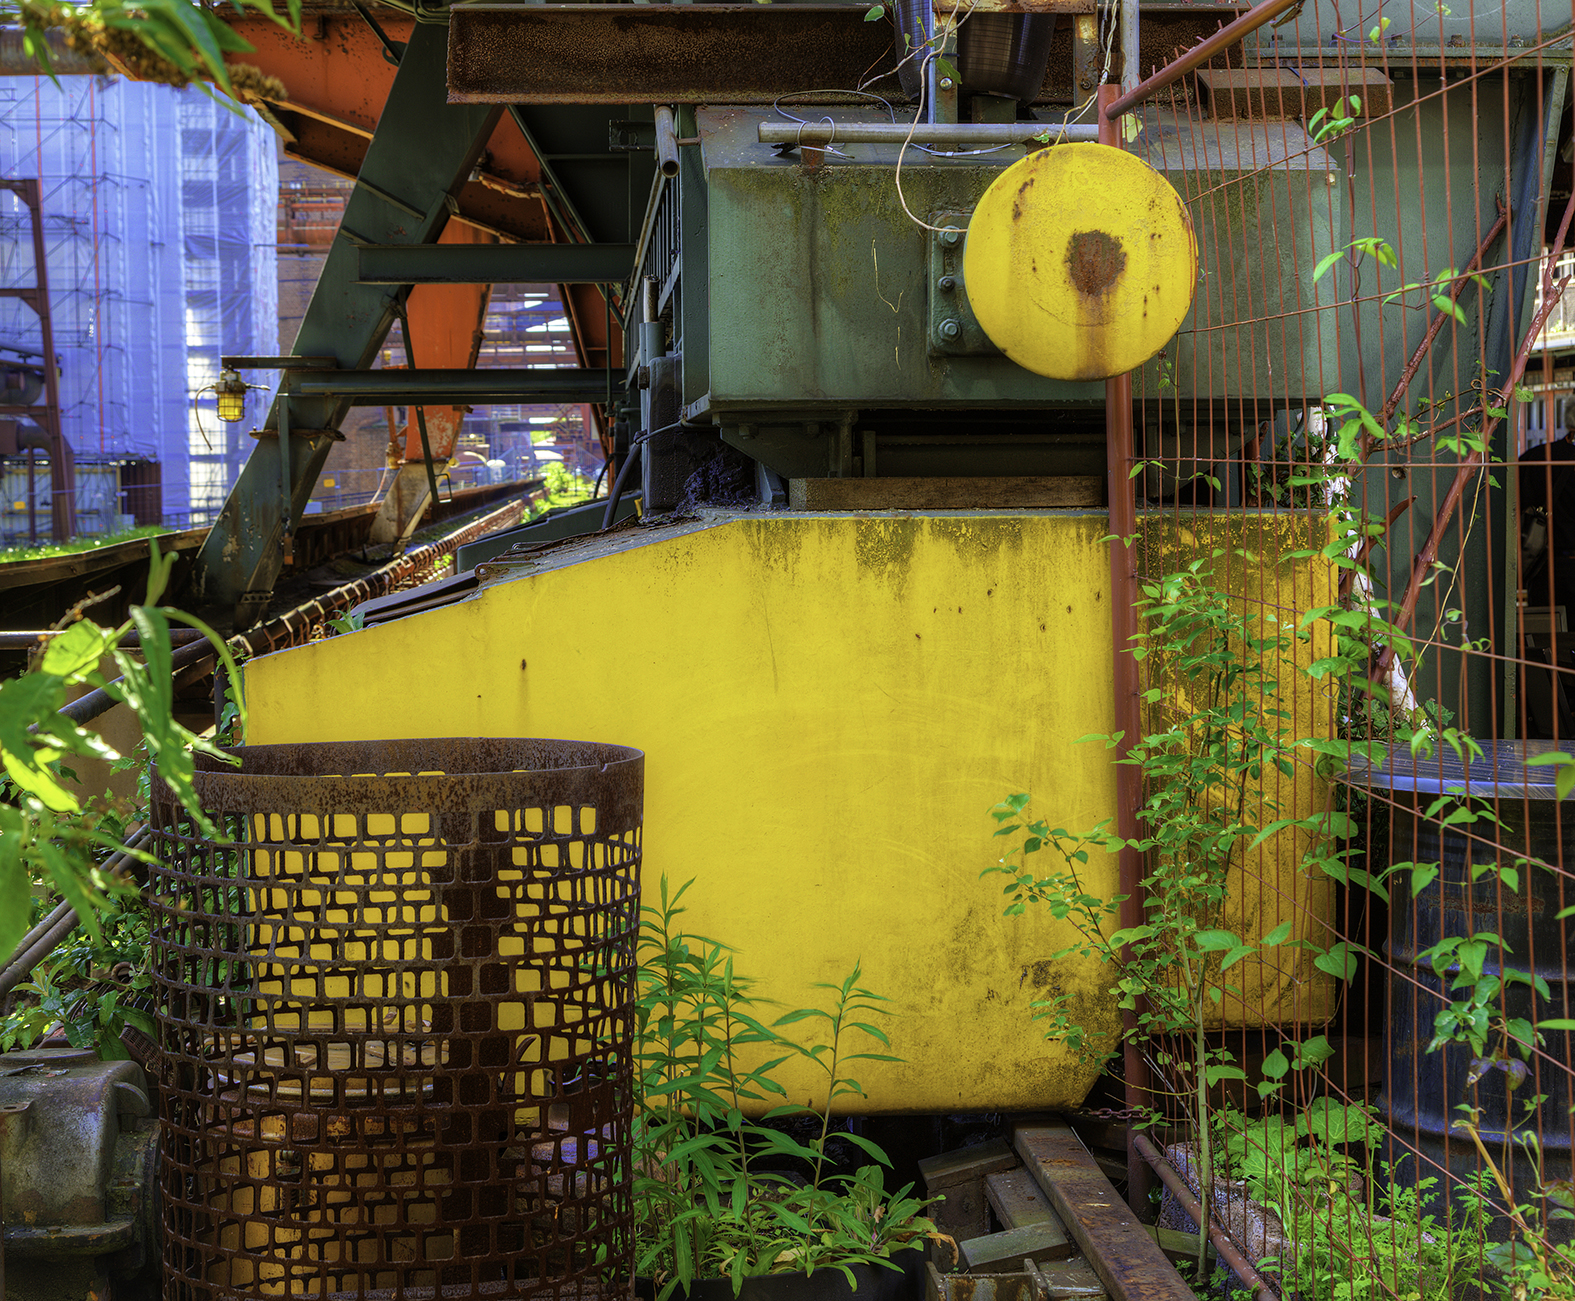 038 Zeche Zollverein.jpg